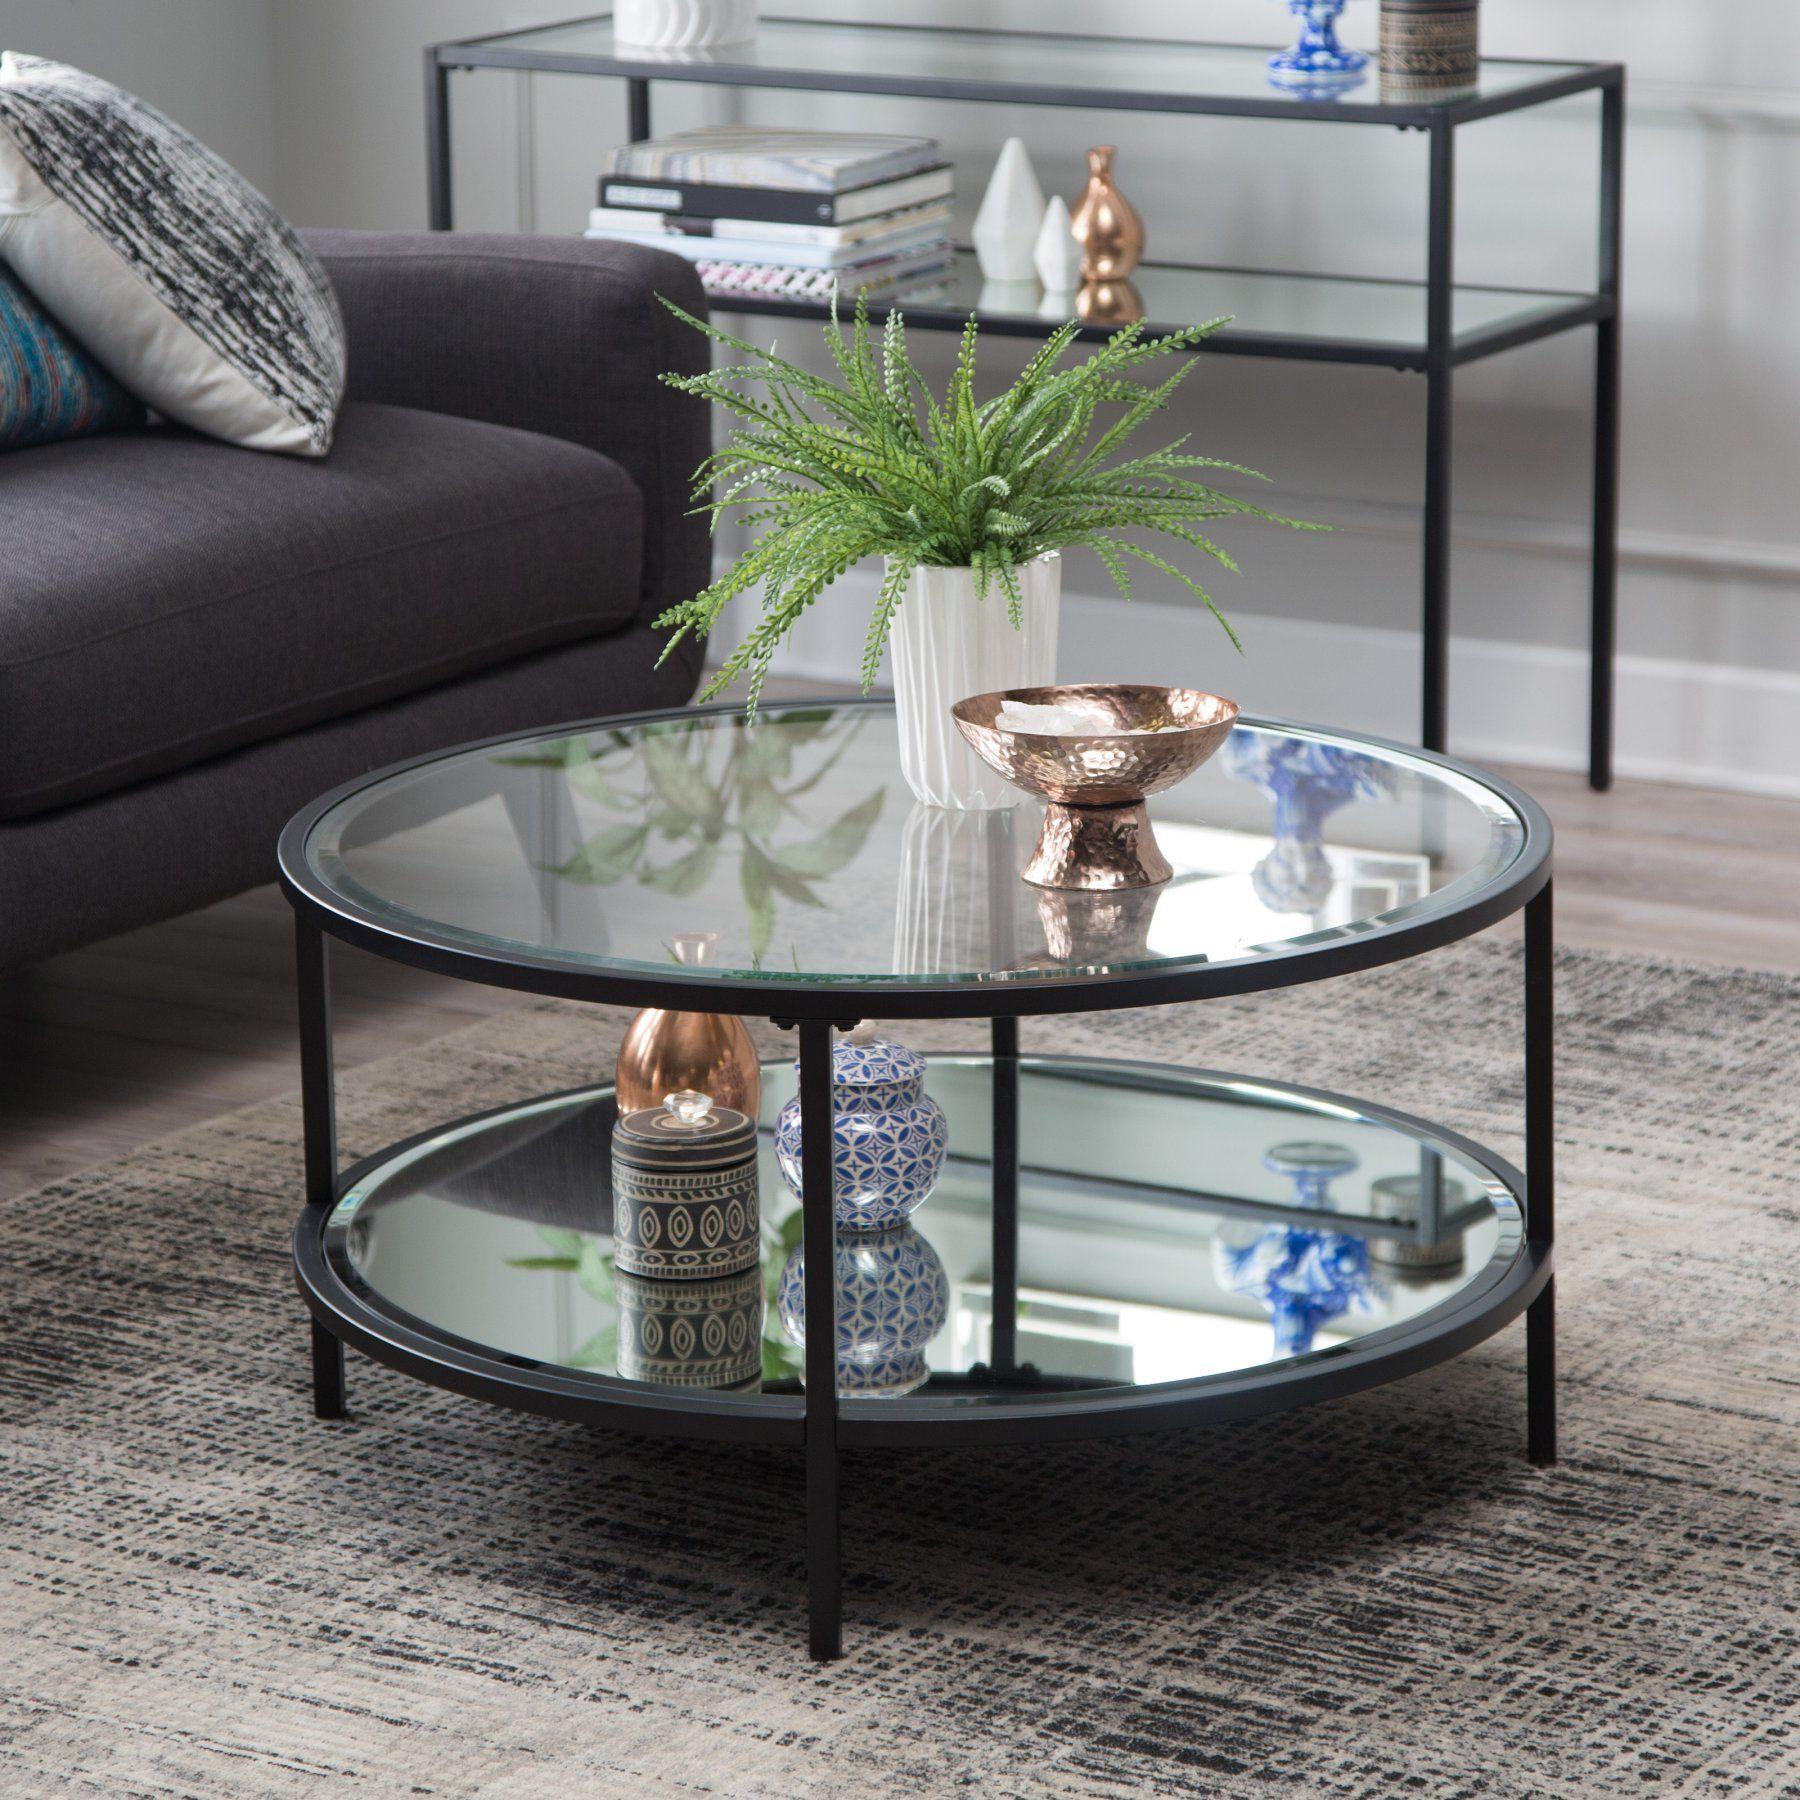 Belham Living Lamont Round Coffee Table Black Rct36 3 Black